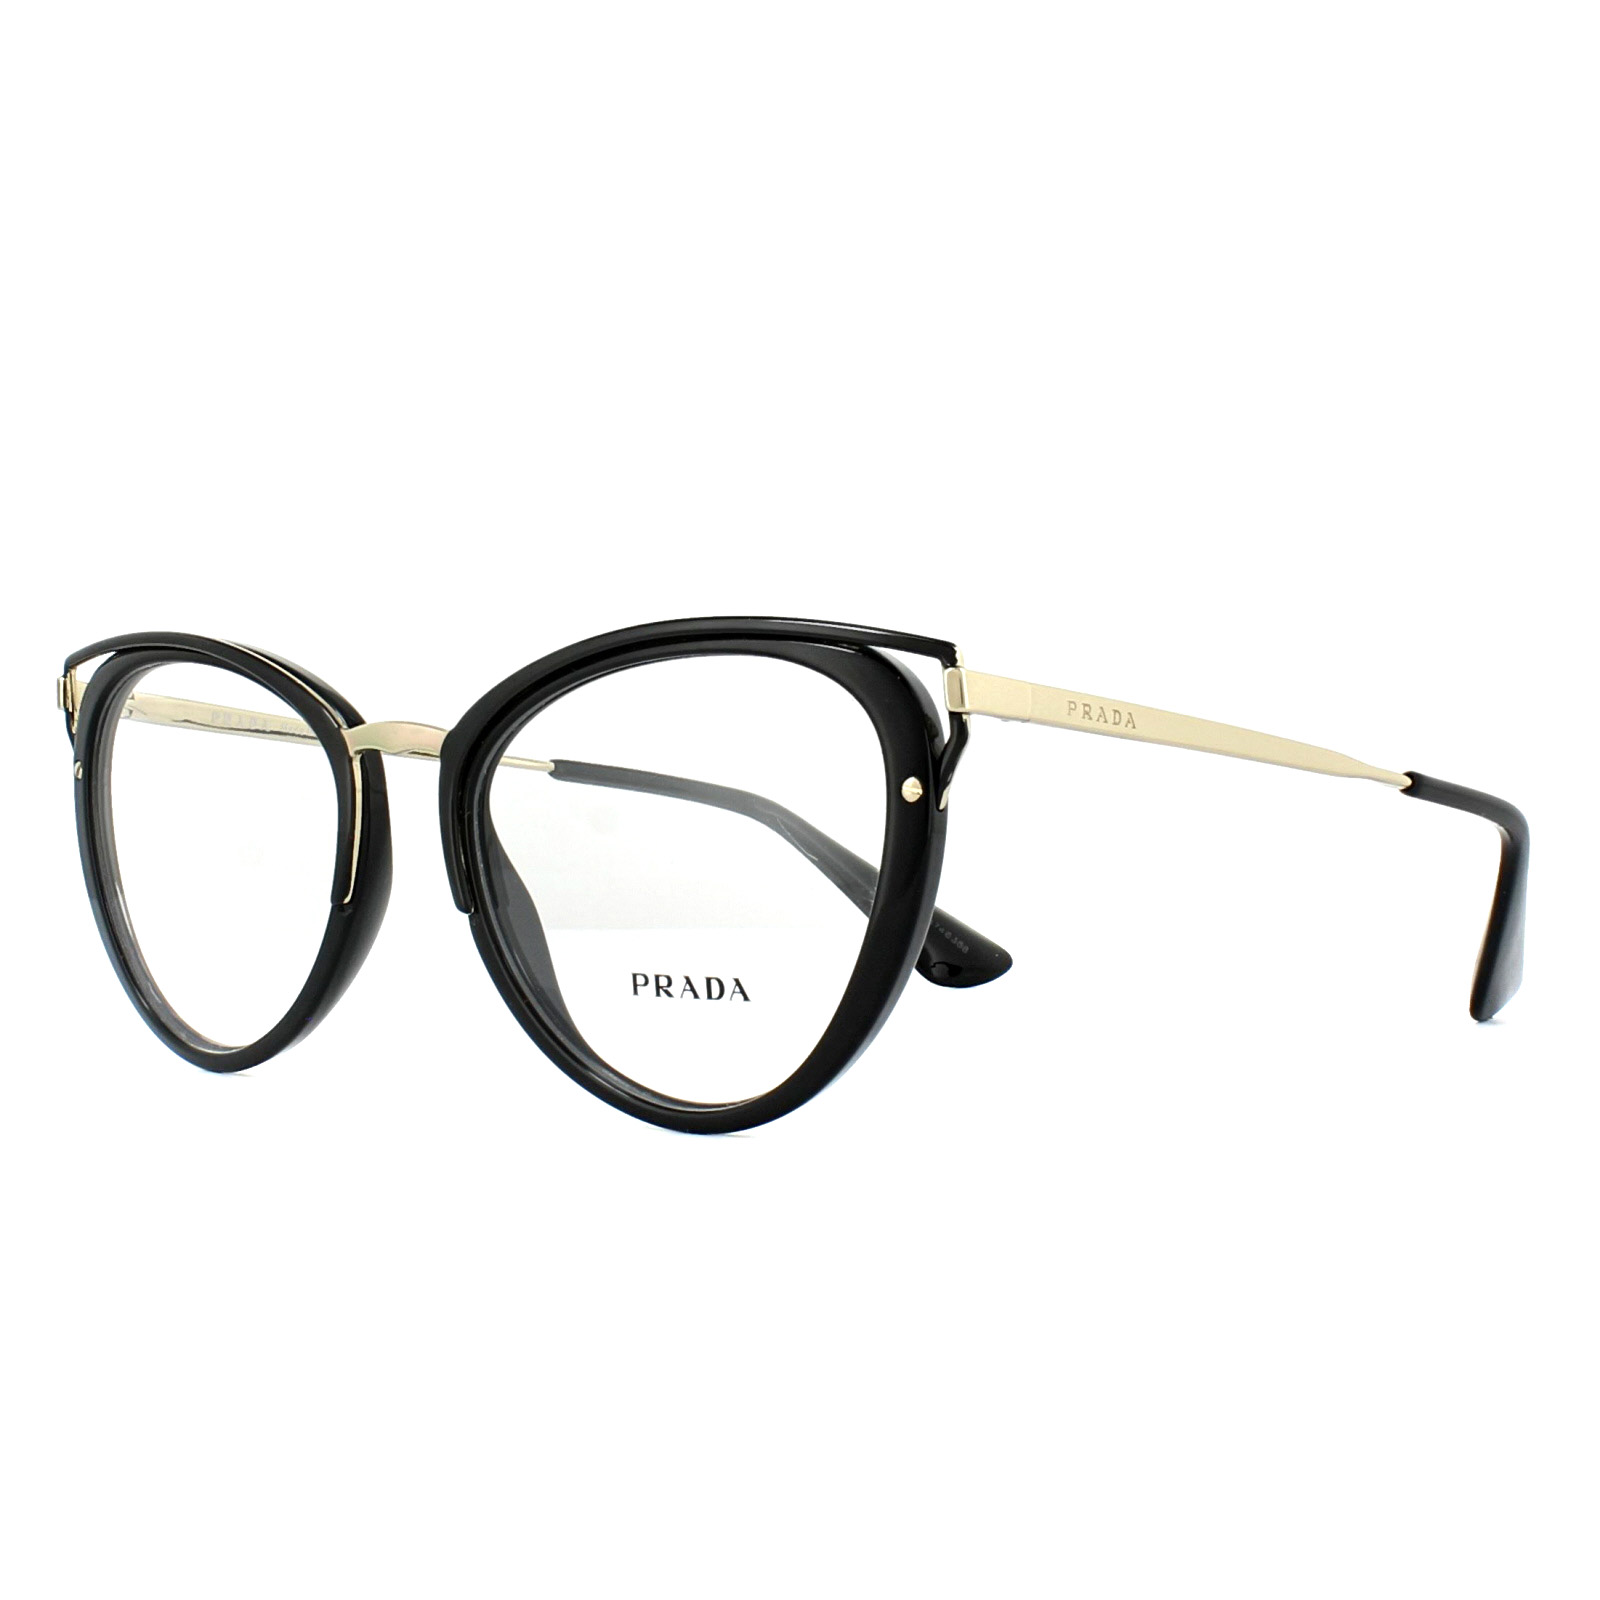 7fecfce1ffb Prada Glasses Frames PR53UV 1AB1O1 Black 50mm Womens 8053672784633 ...